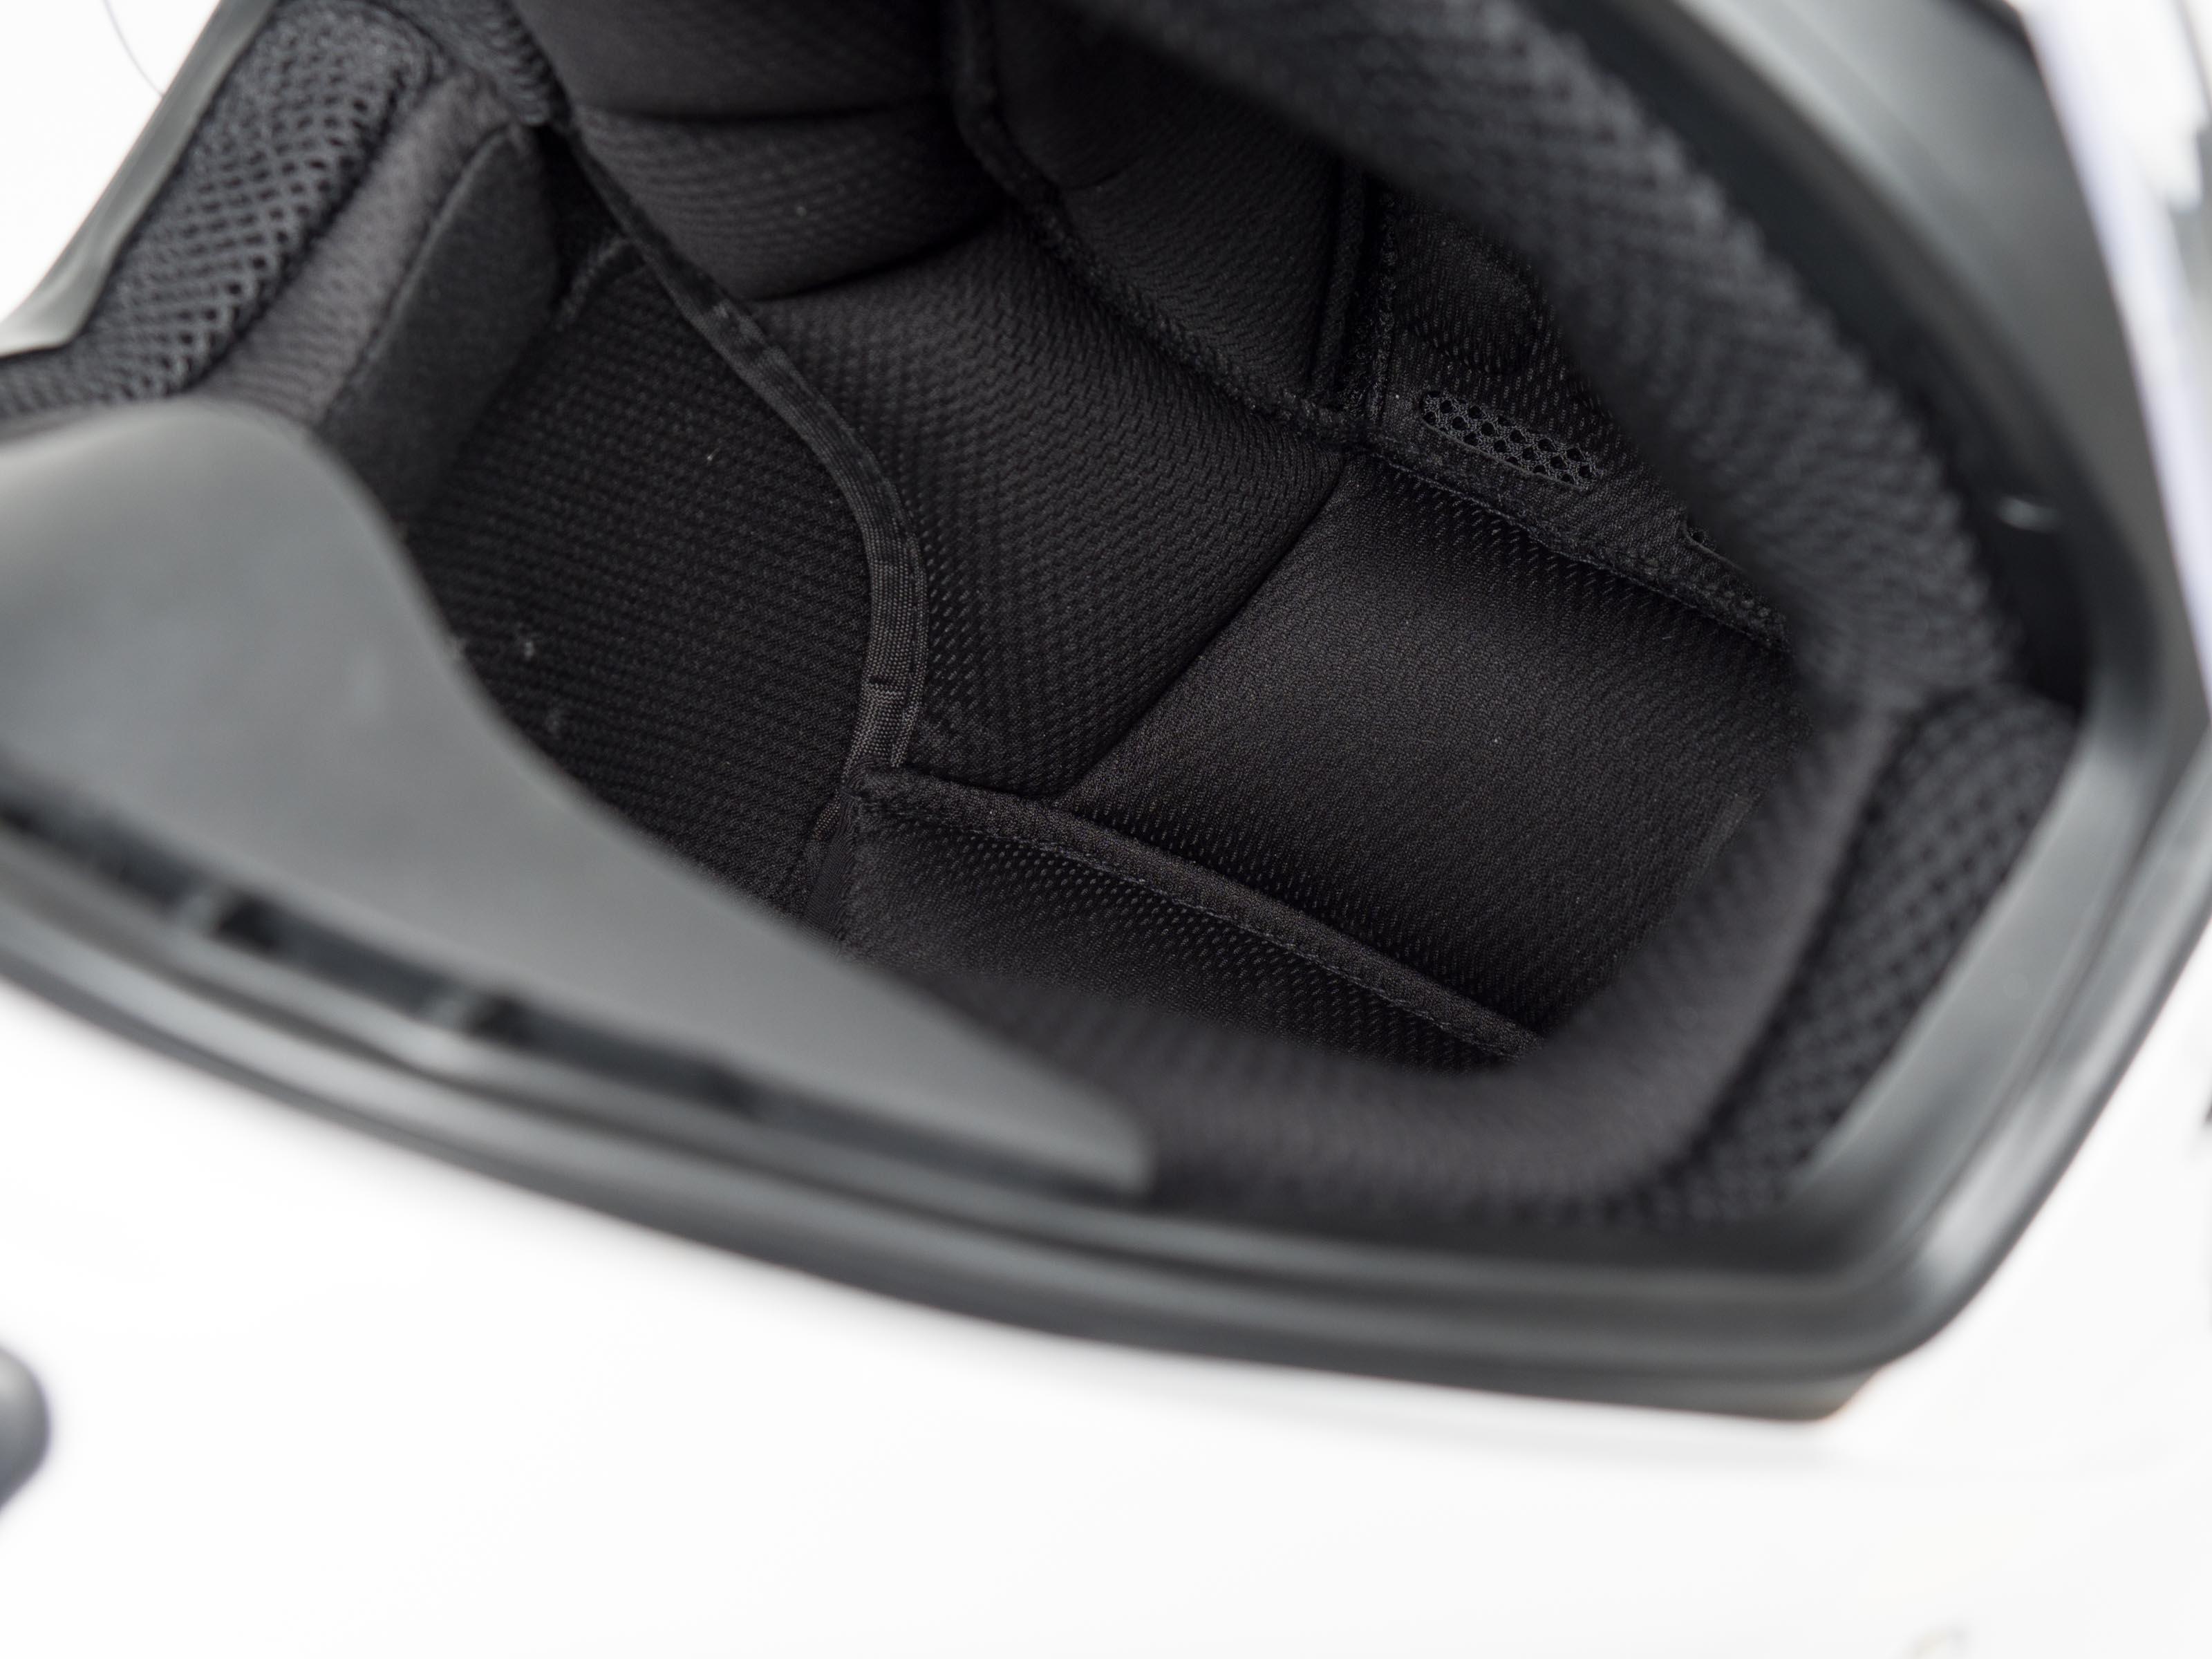 Sena Momentum Helmet Review